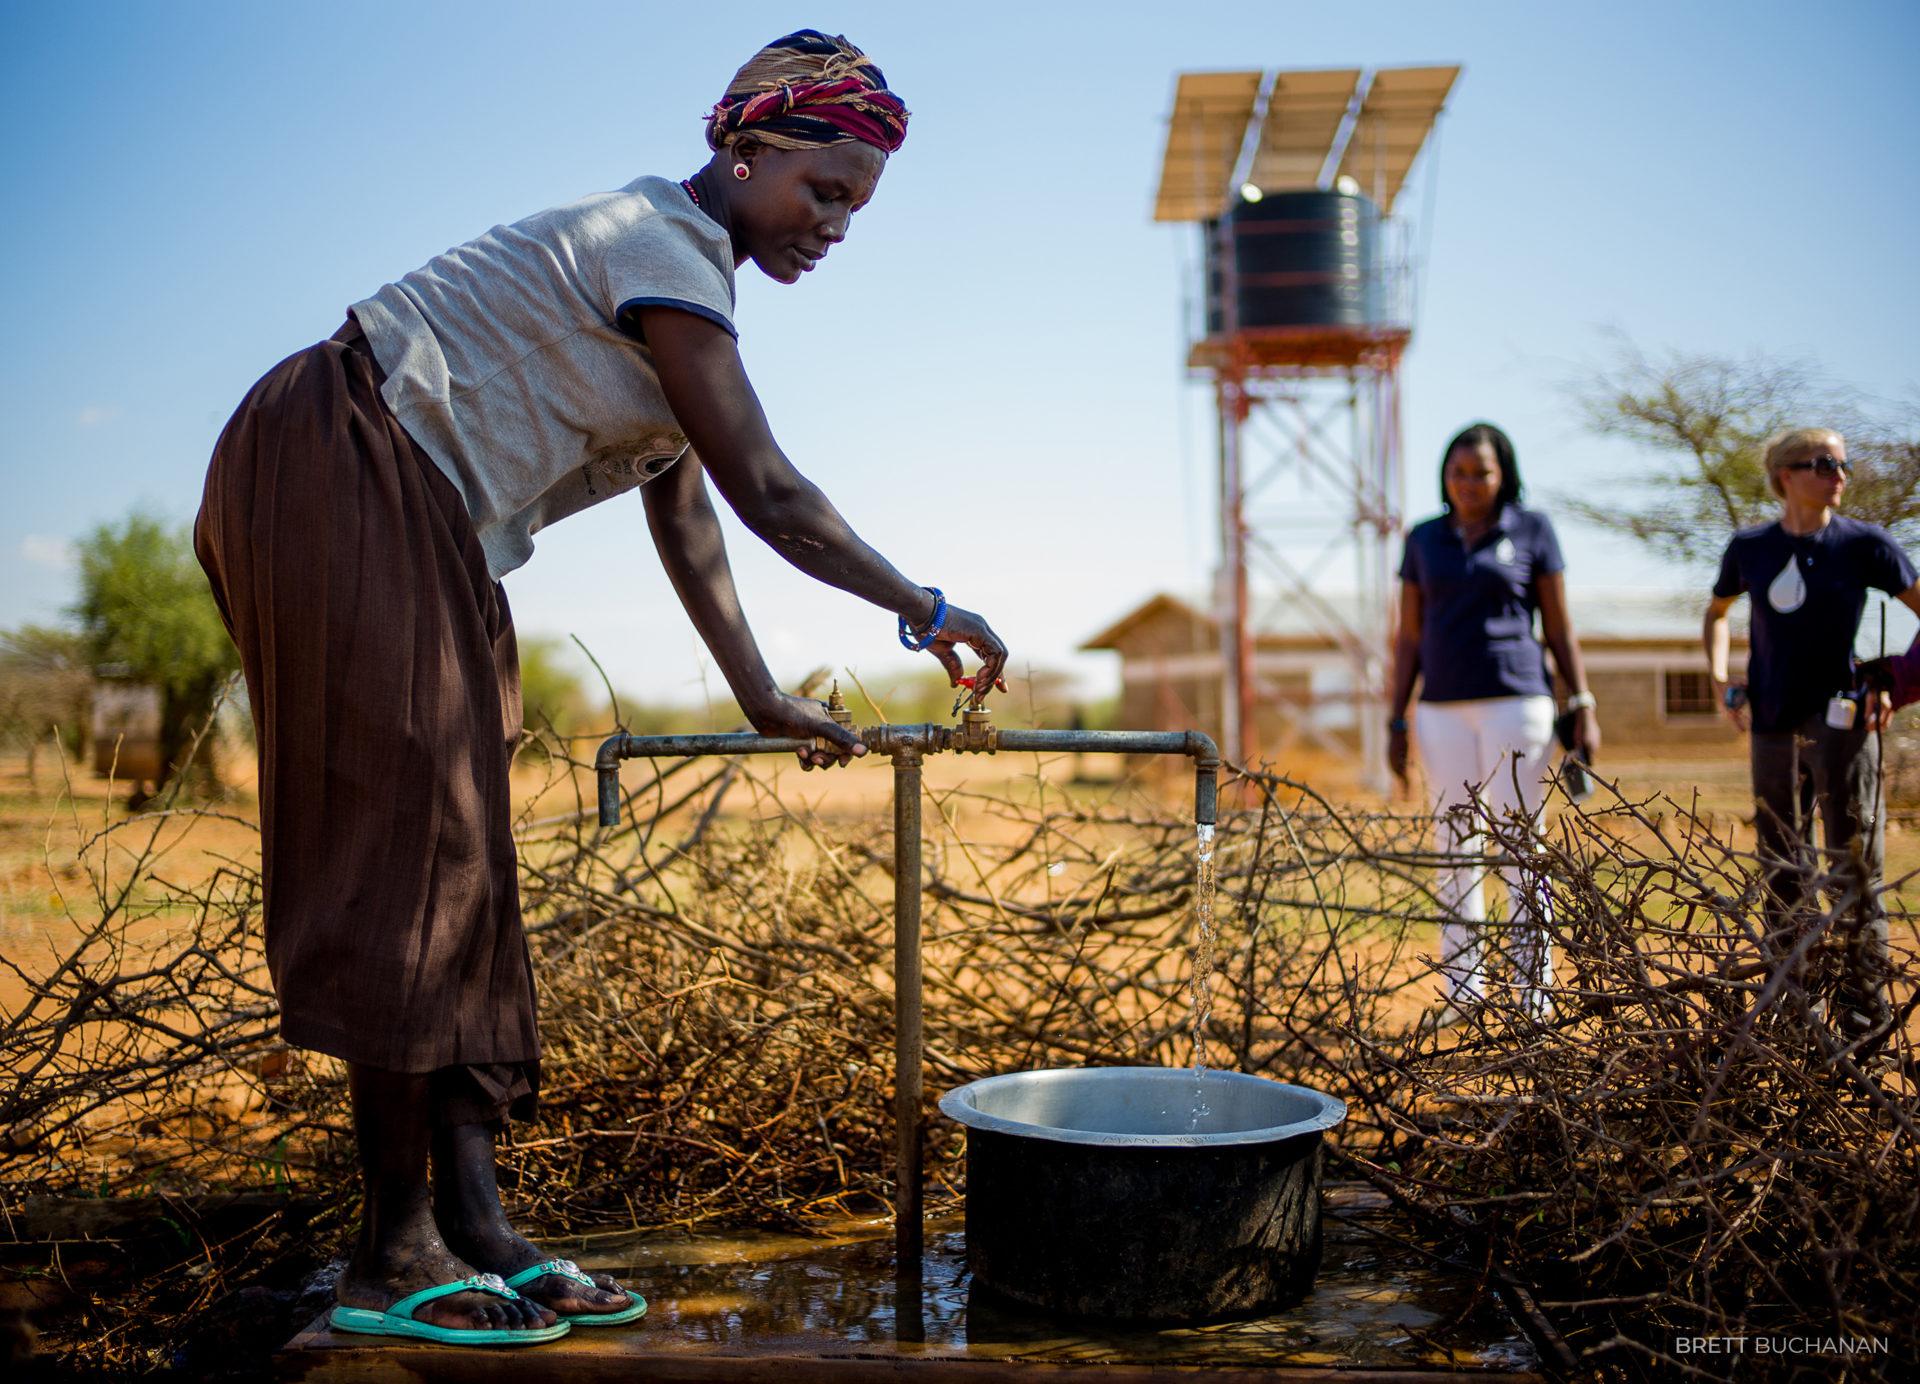 Brett-Buchanan-Kenya-water-development-NGO-06